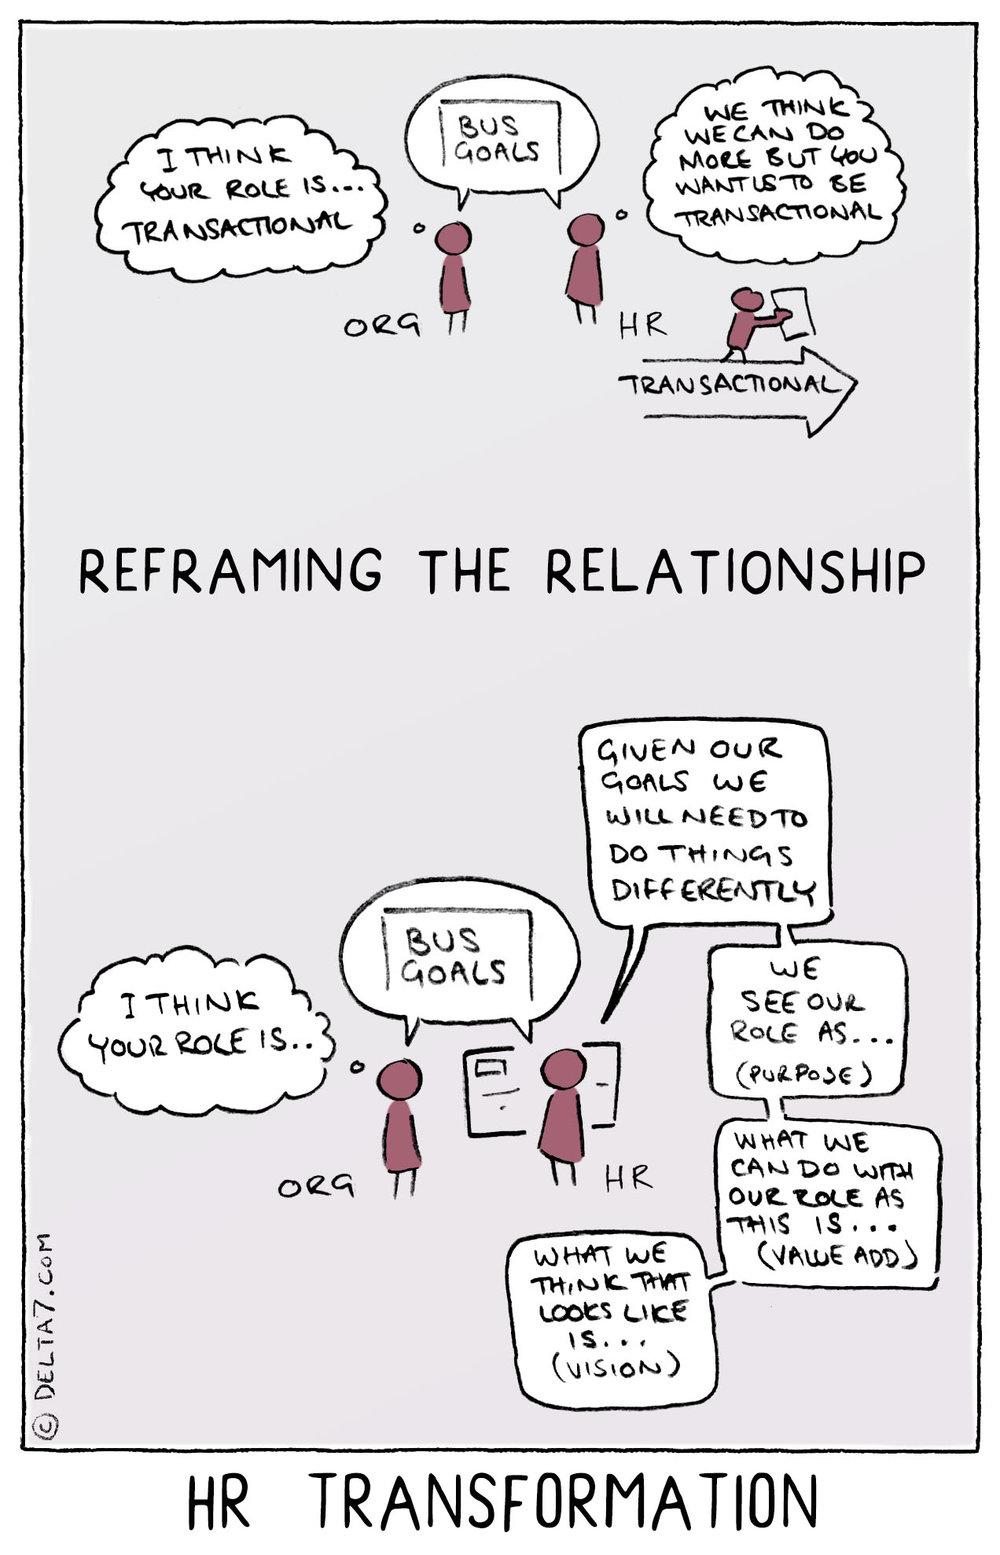 HR-transformation.jpg